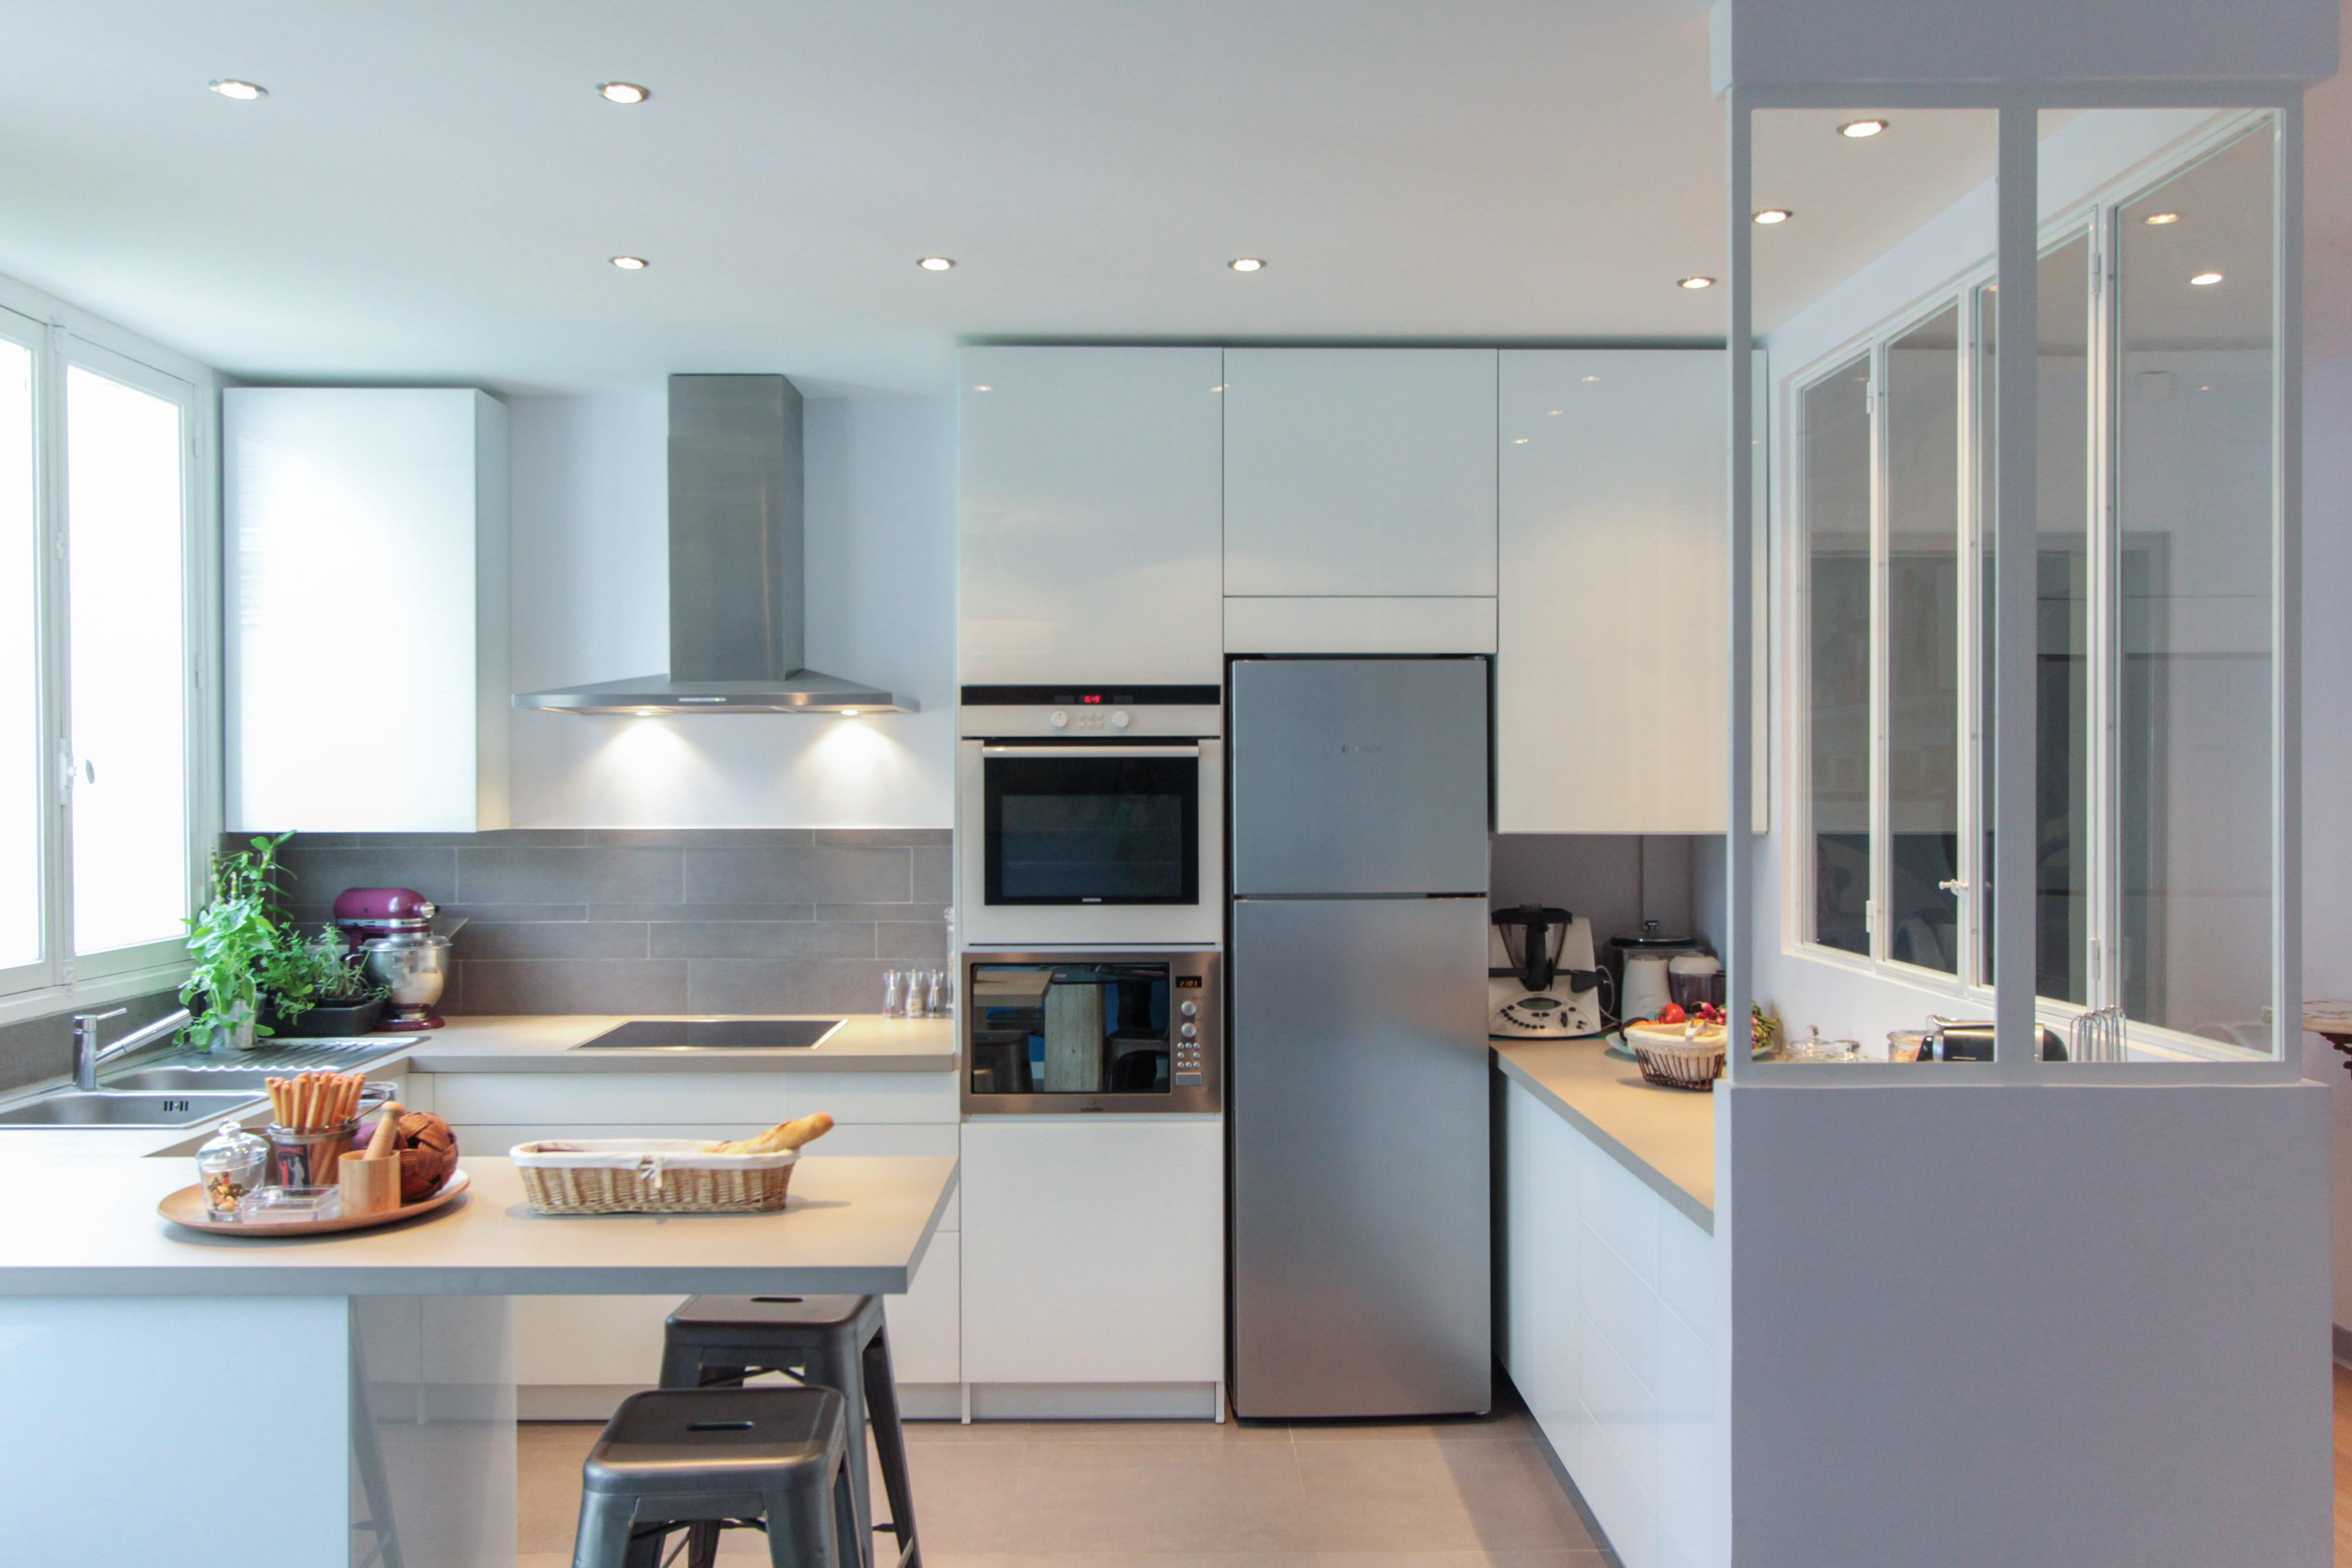 Cuisine moderne avec verri re - Creer une cuisine ouverte ...